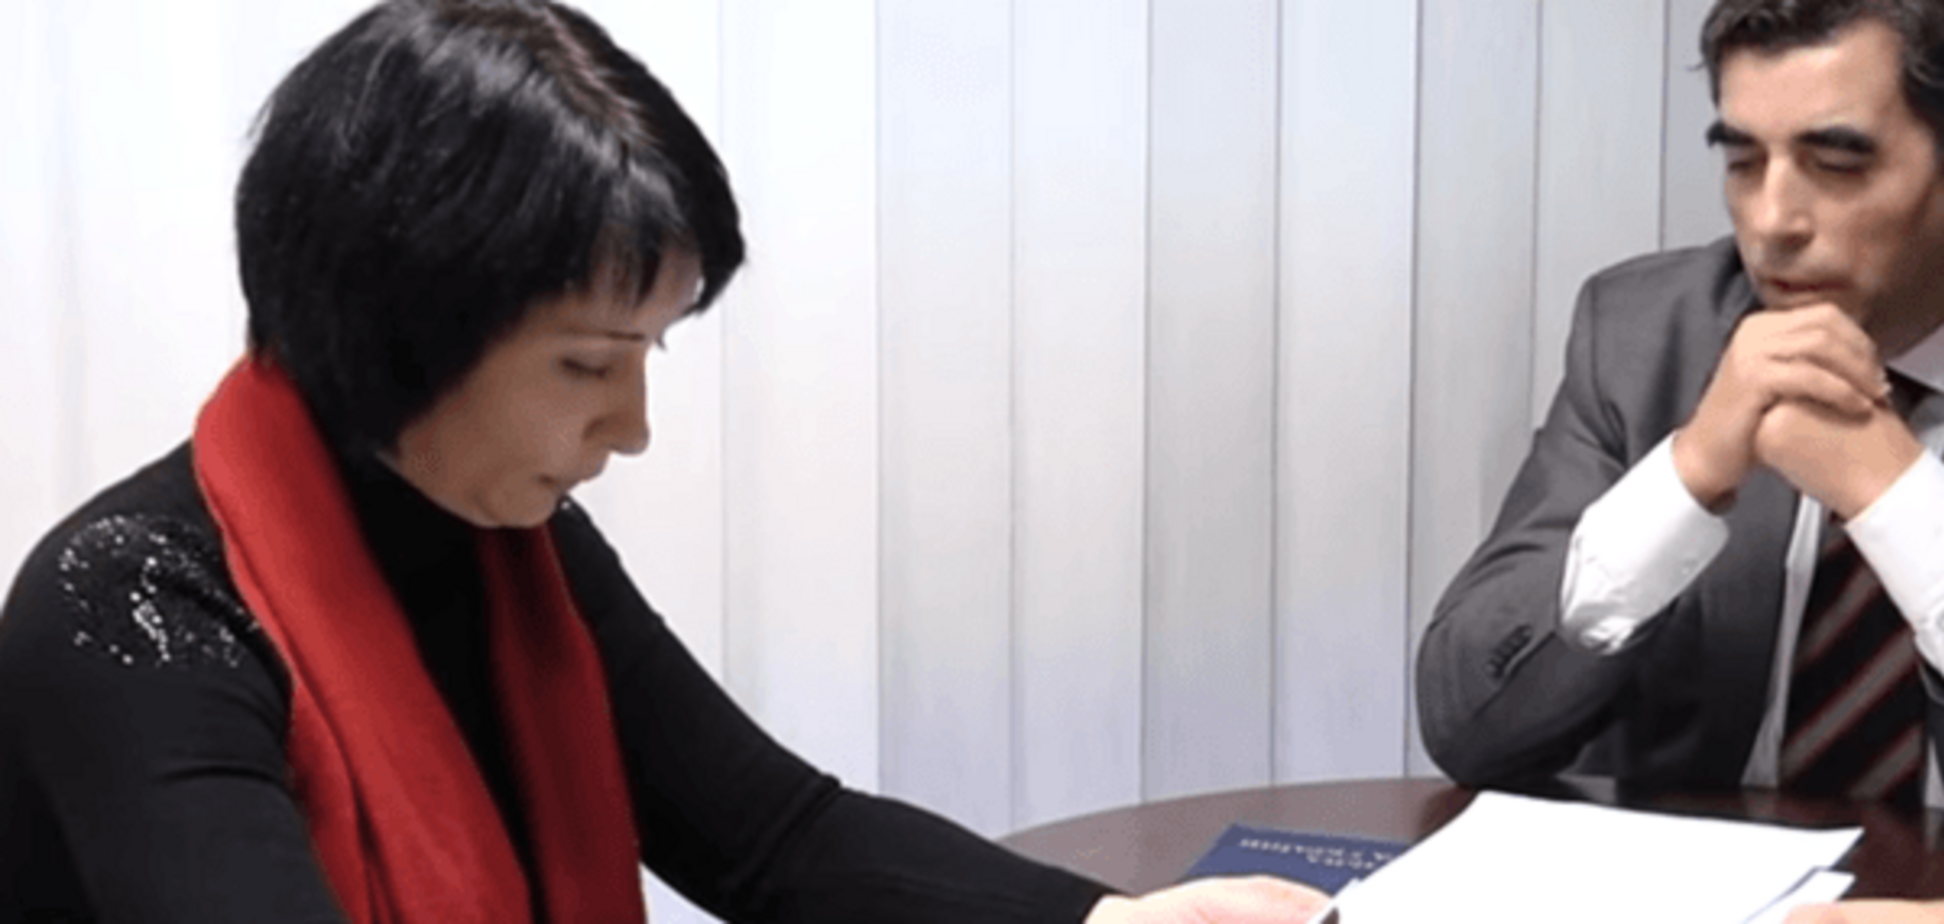 Генпрокуратура объявила Лукаш о подозрении: опубликовано видео